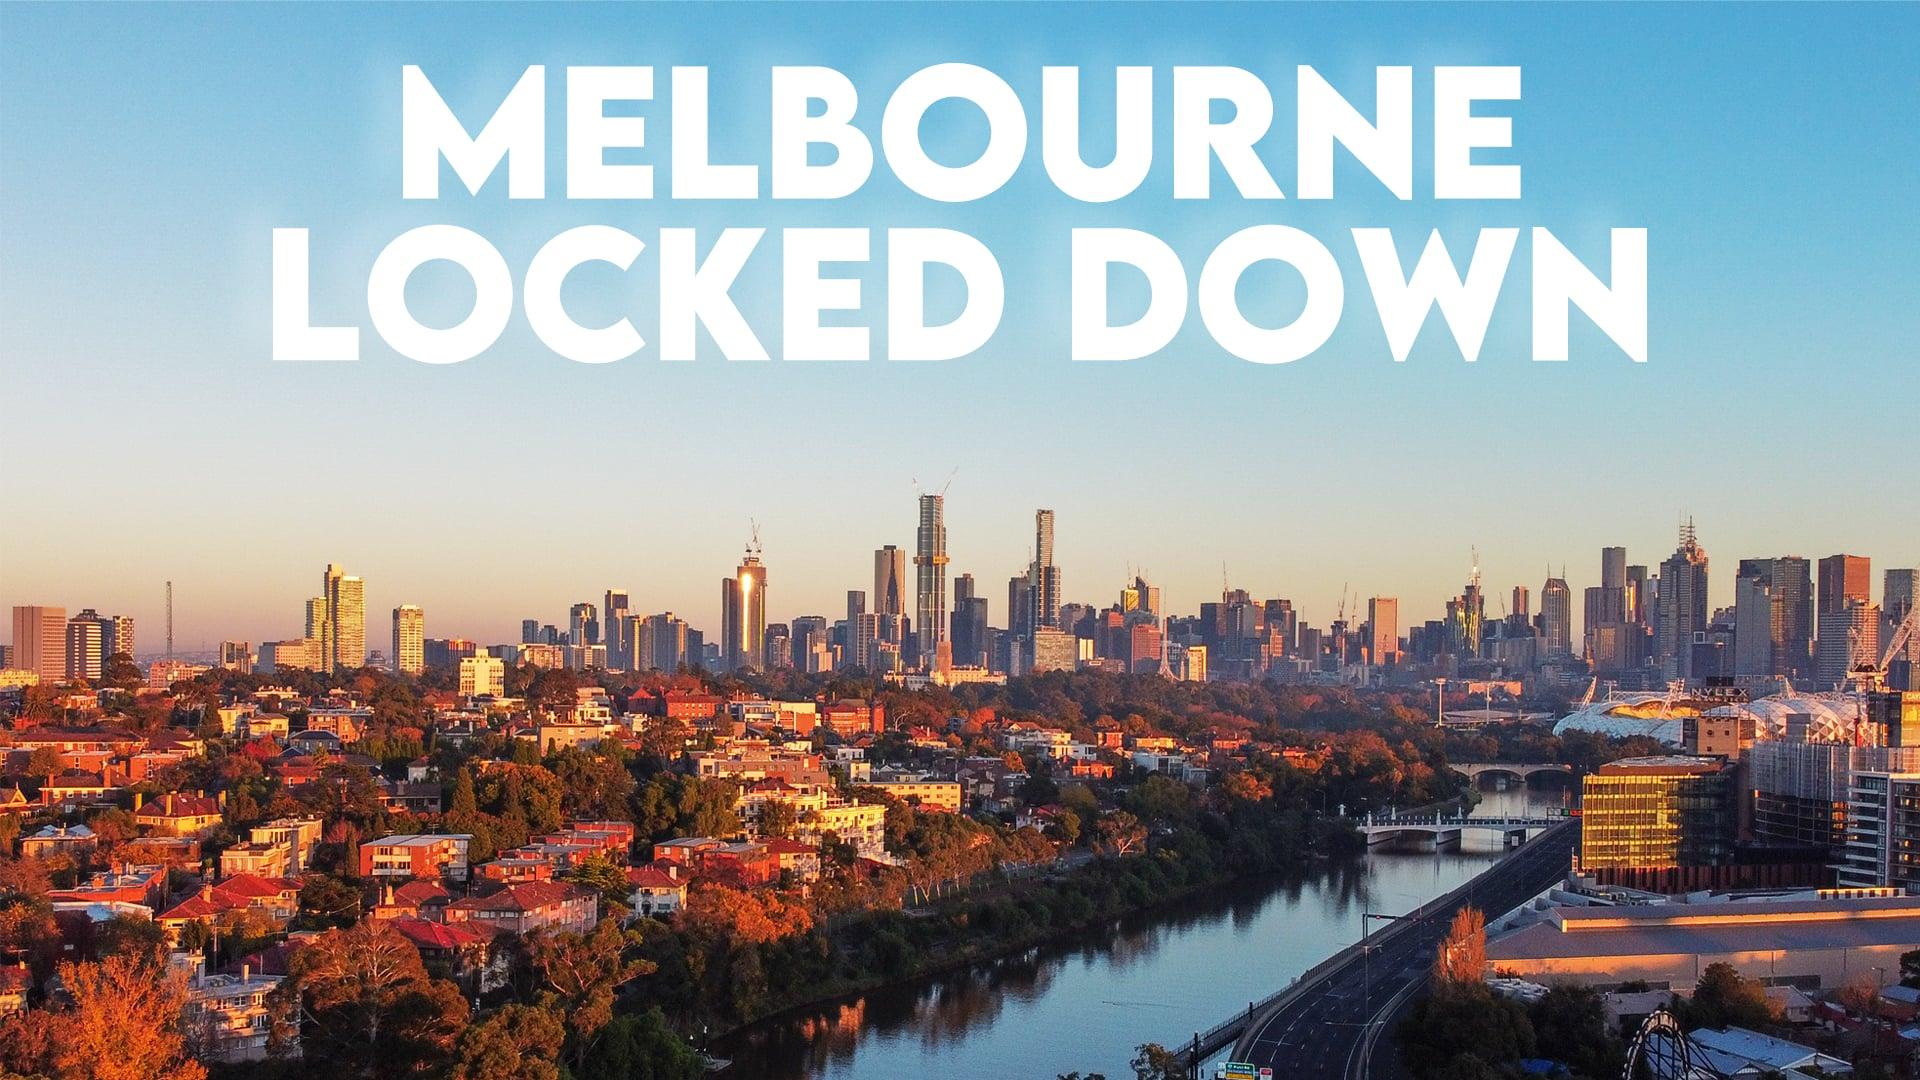 Melbourne Locked Down